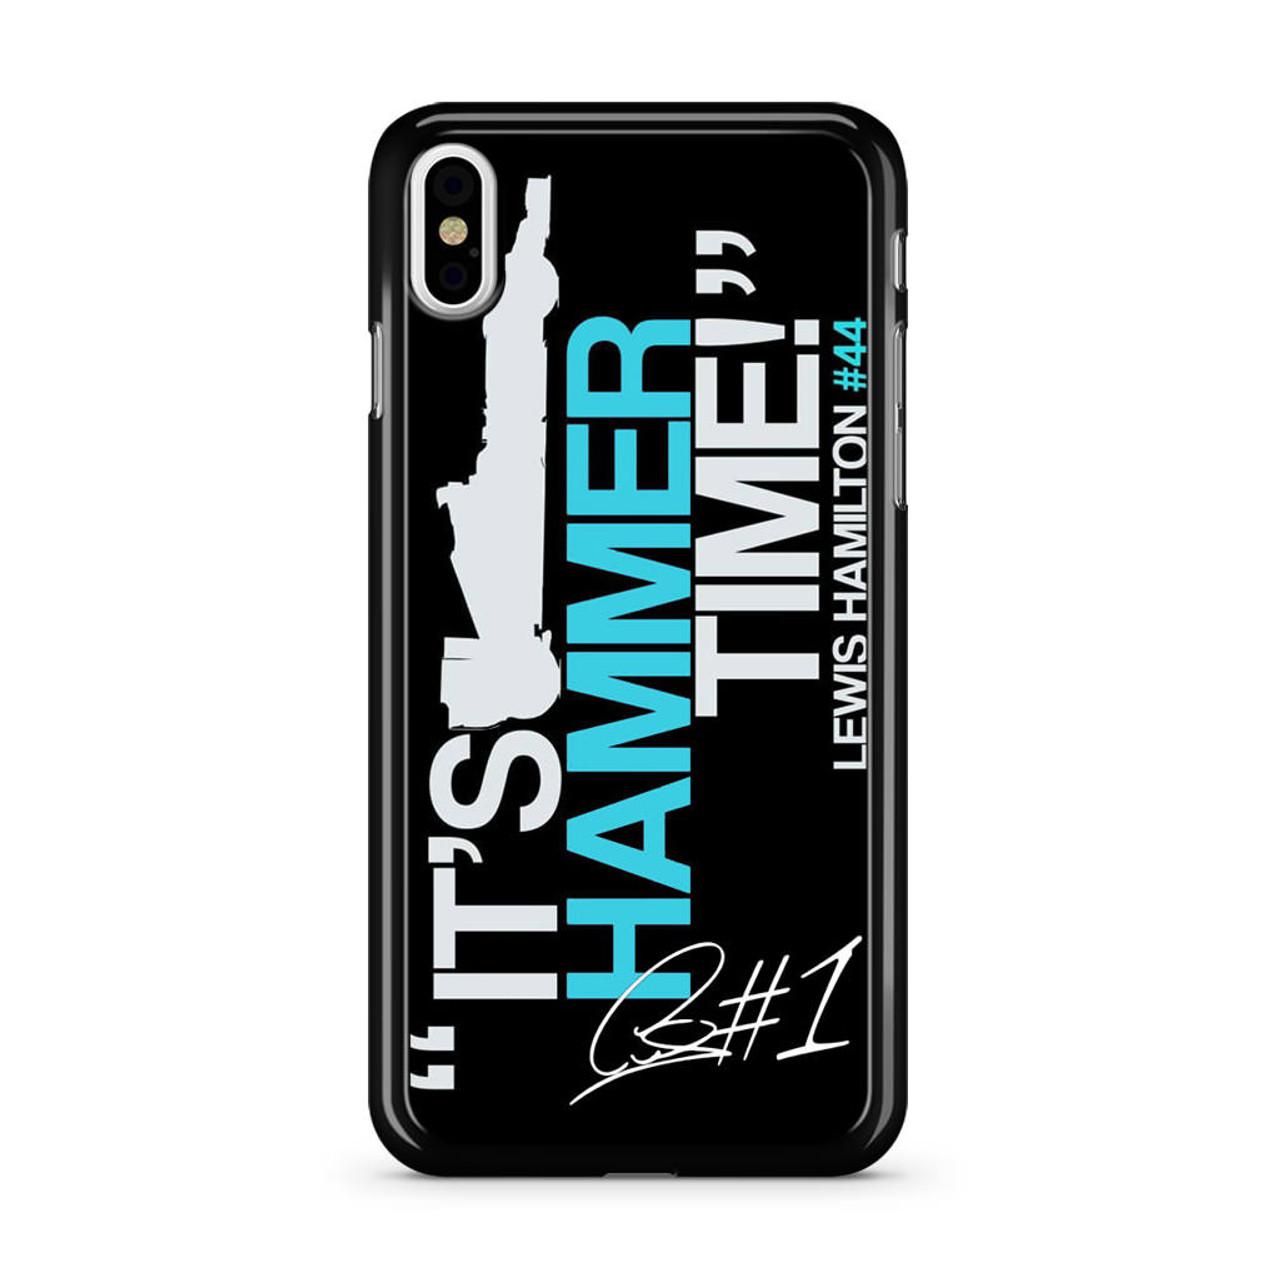 finest selection 186eb 43f19 Lewis Hamilton iPhone X Case